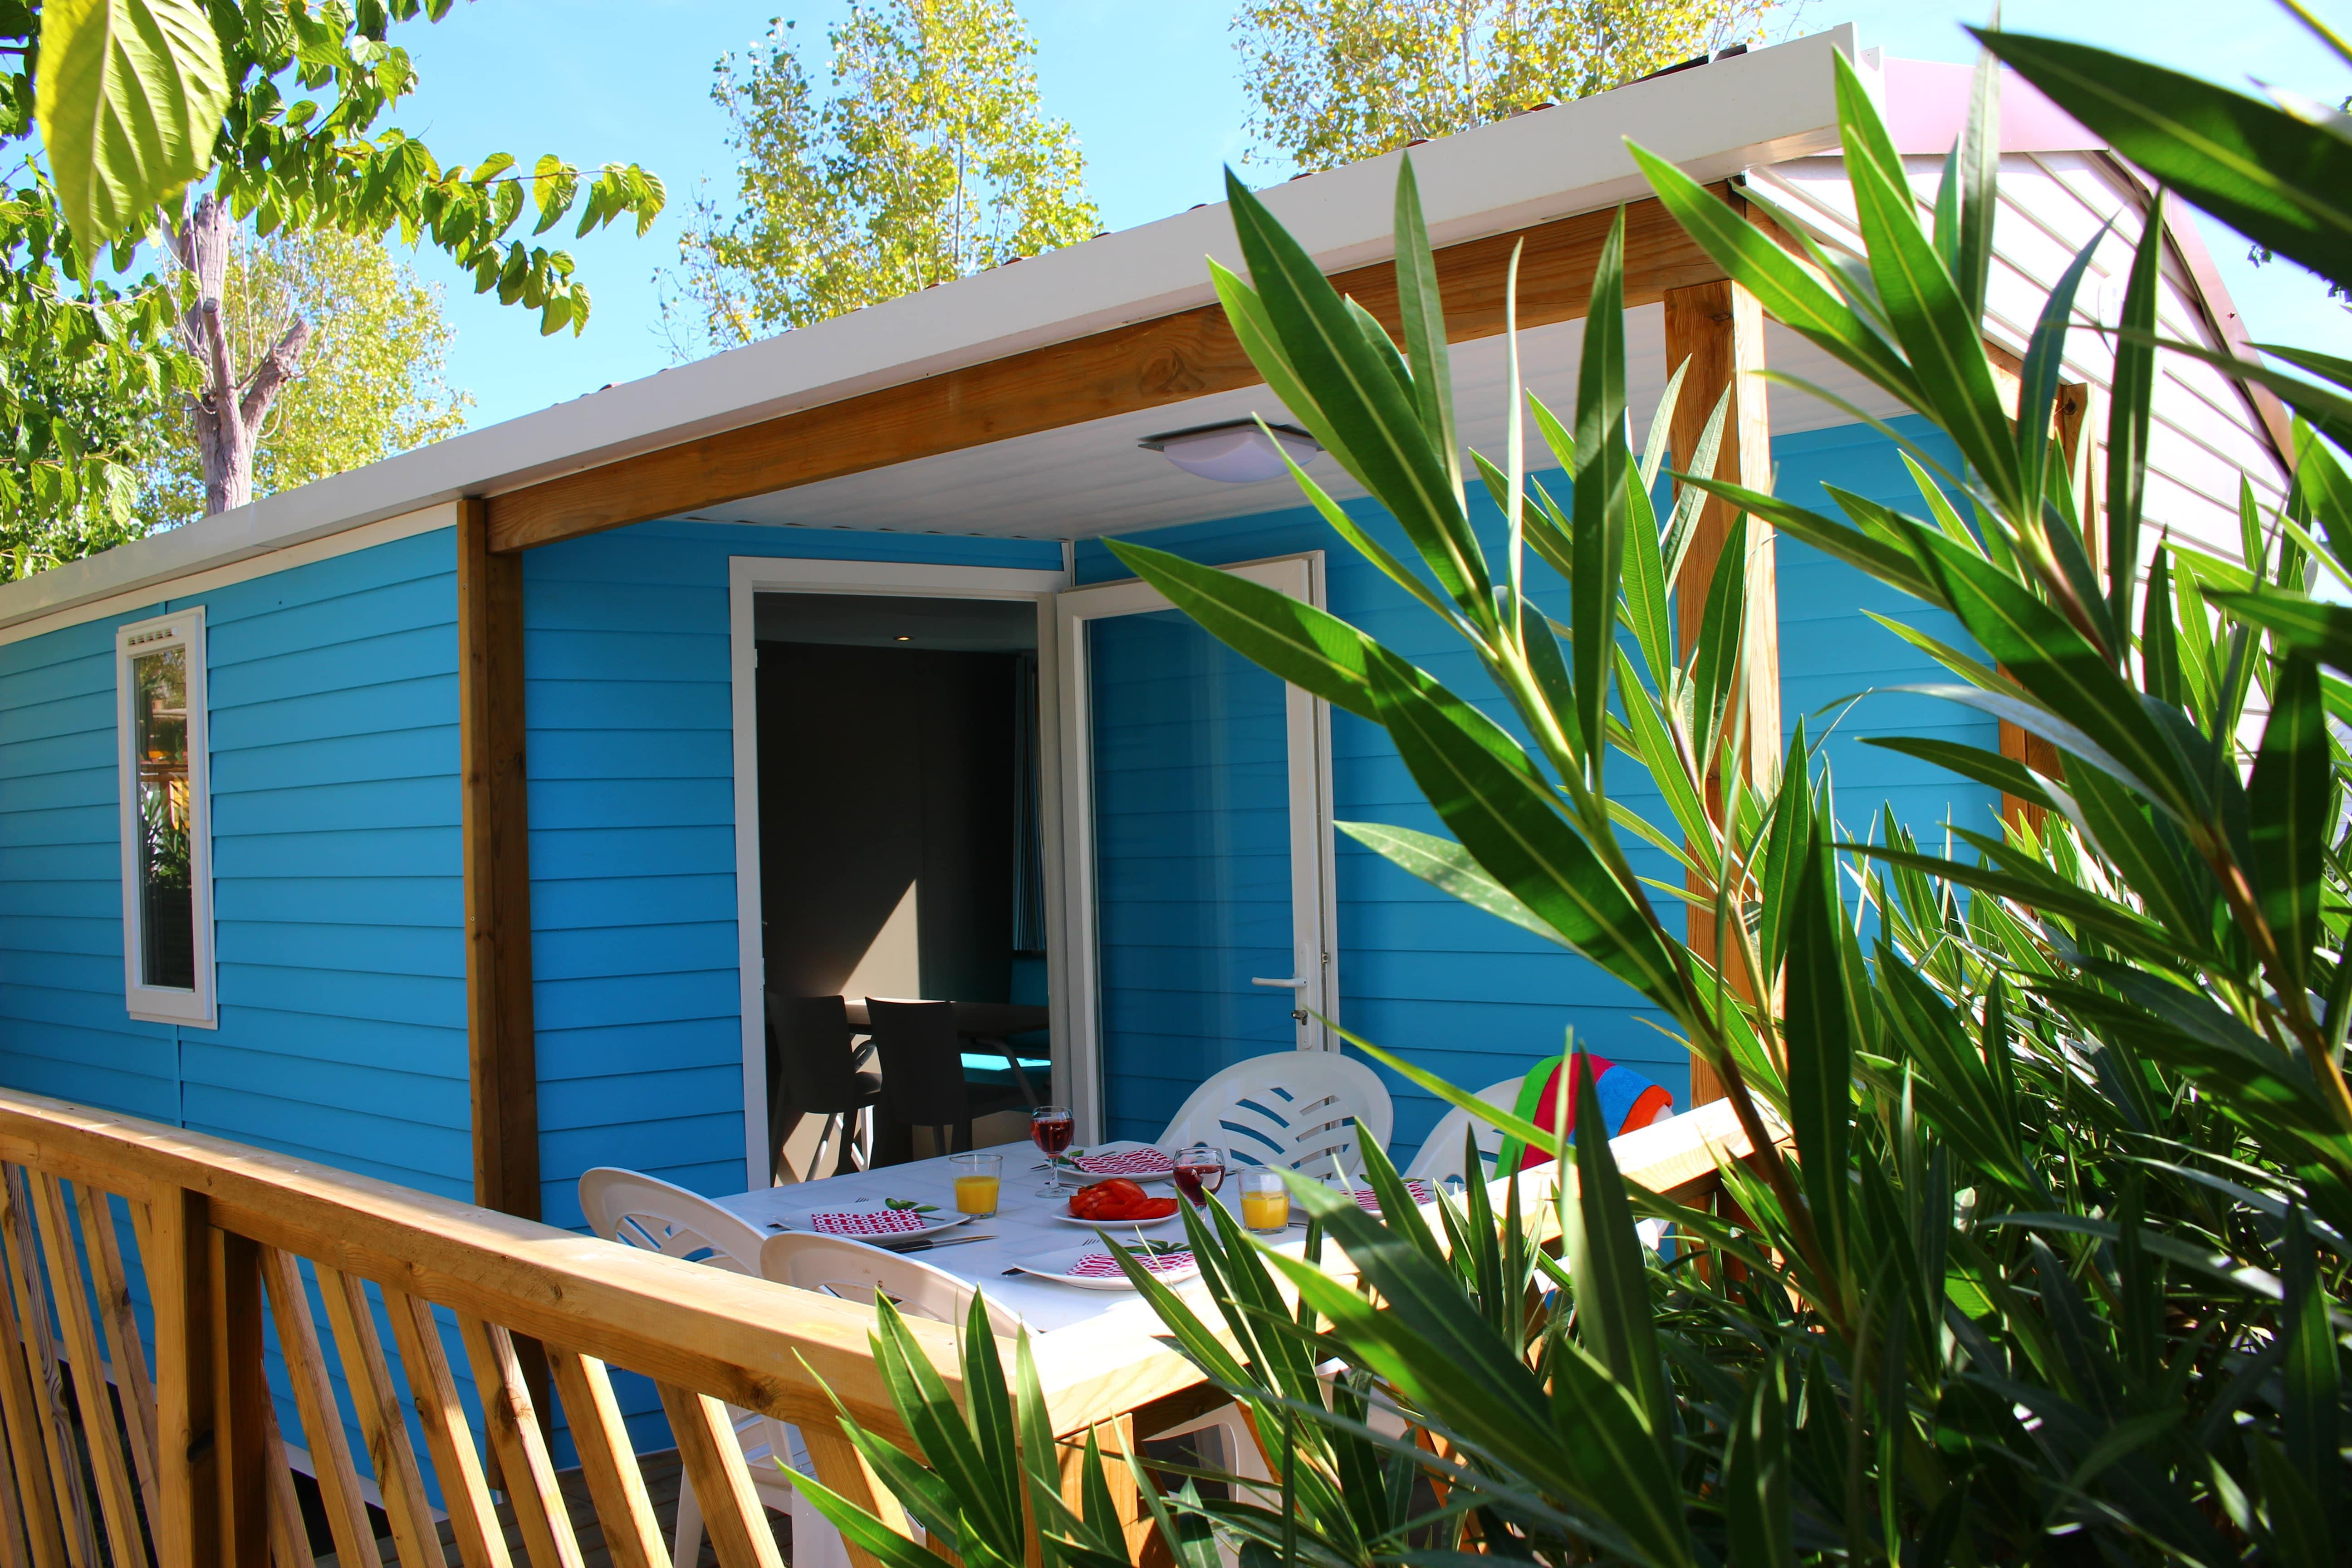 Location - Cancun, Premium - Dimanche - 2 Chambres - Camping L'Air Marin